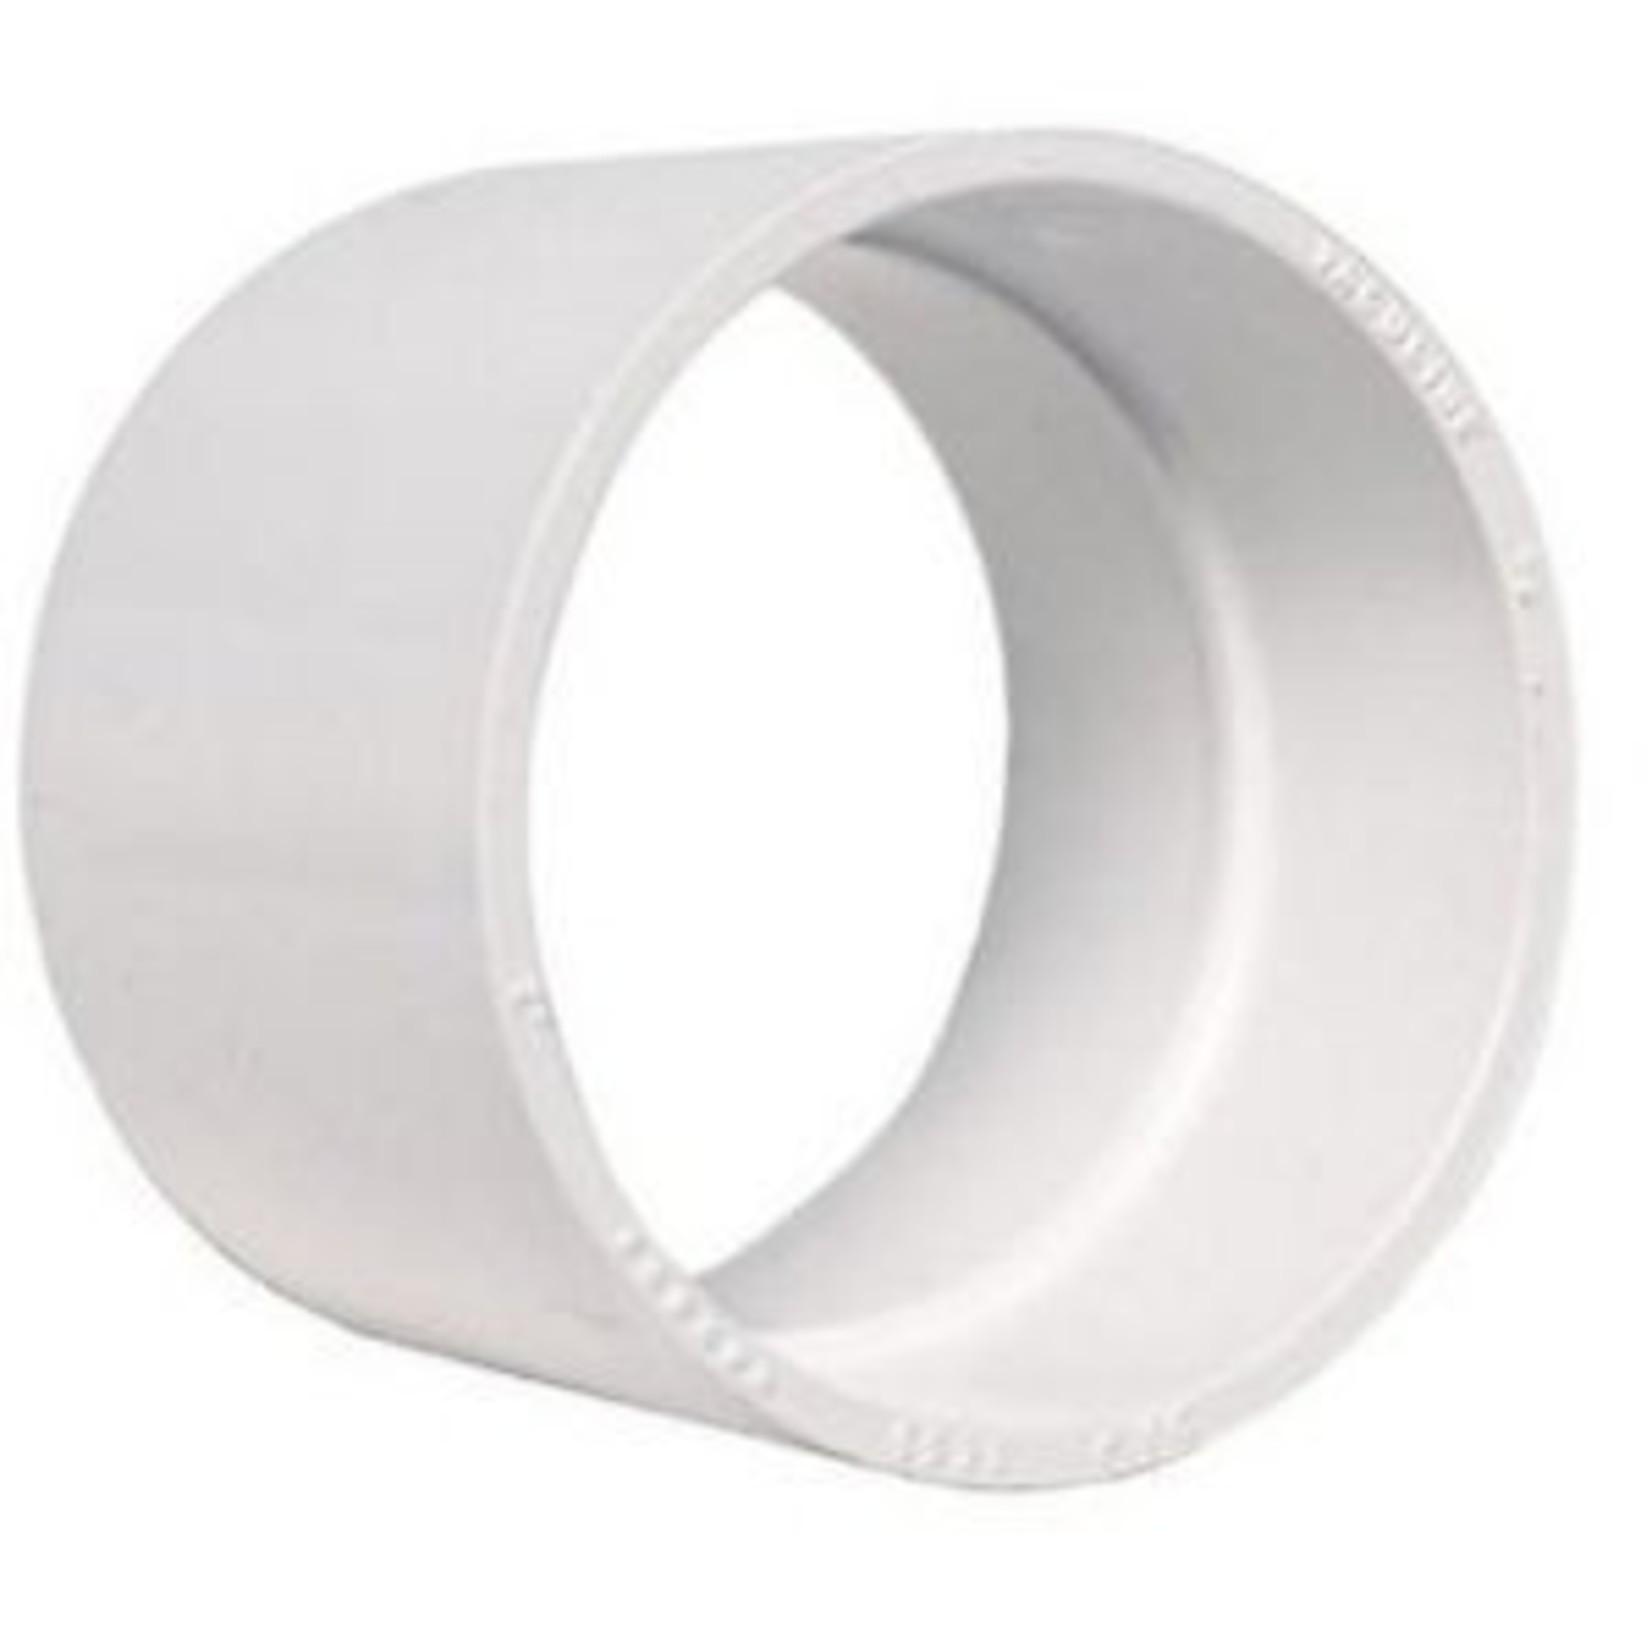 Plastiflex CVS Stop Coupling Fitting - (Box of 200pcs)